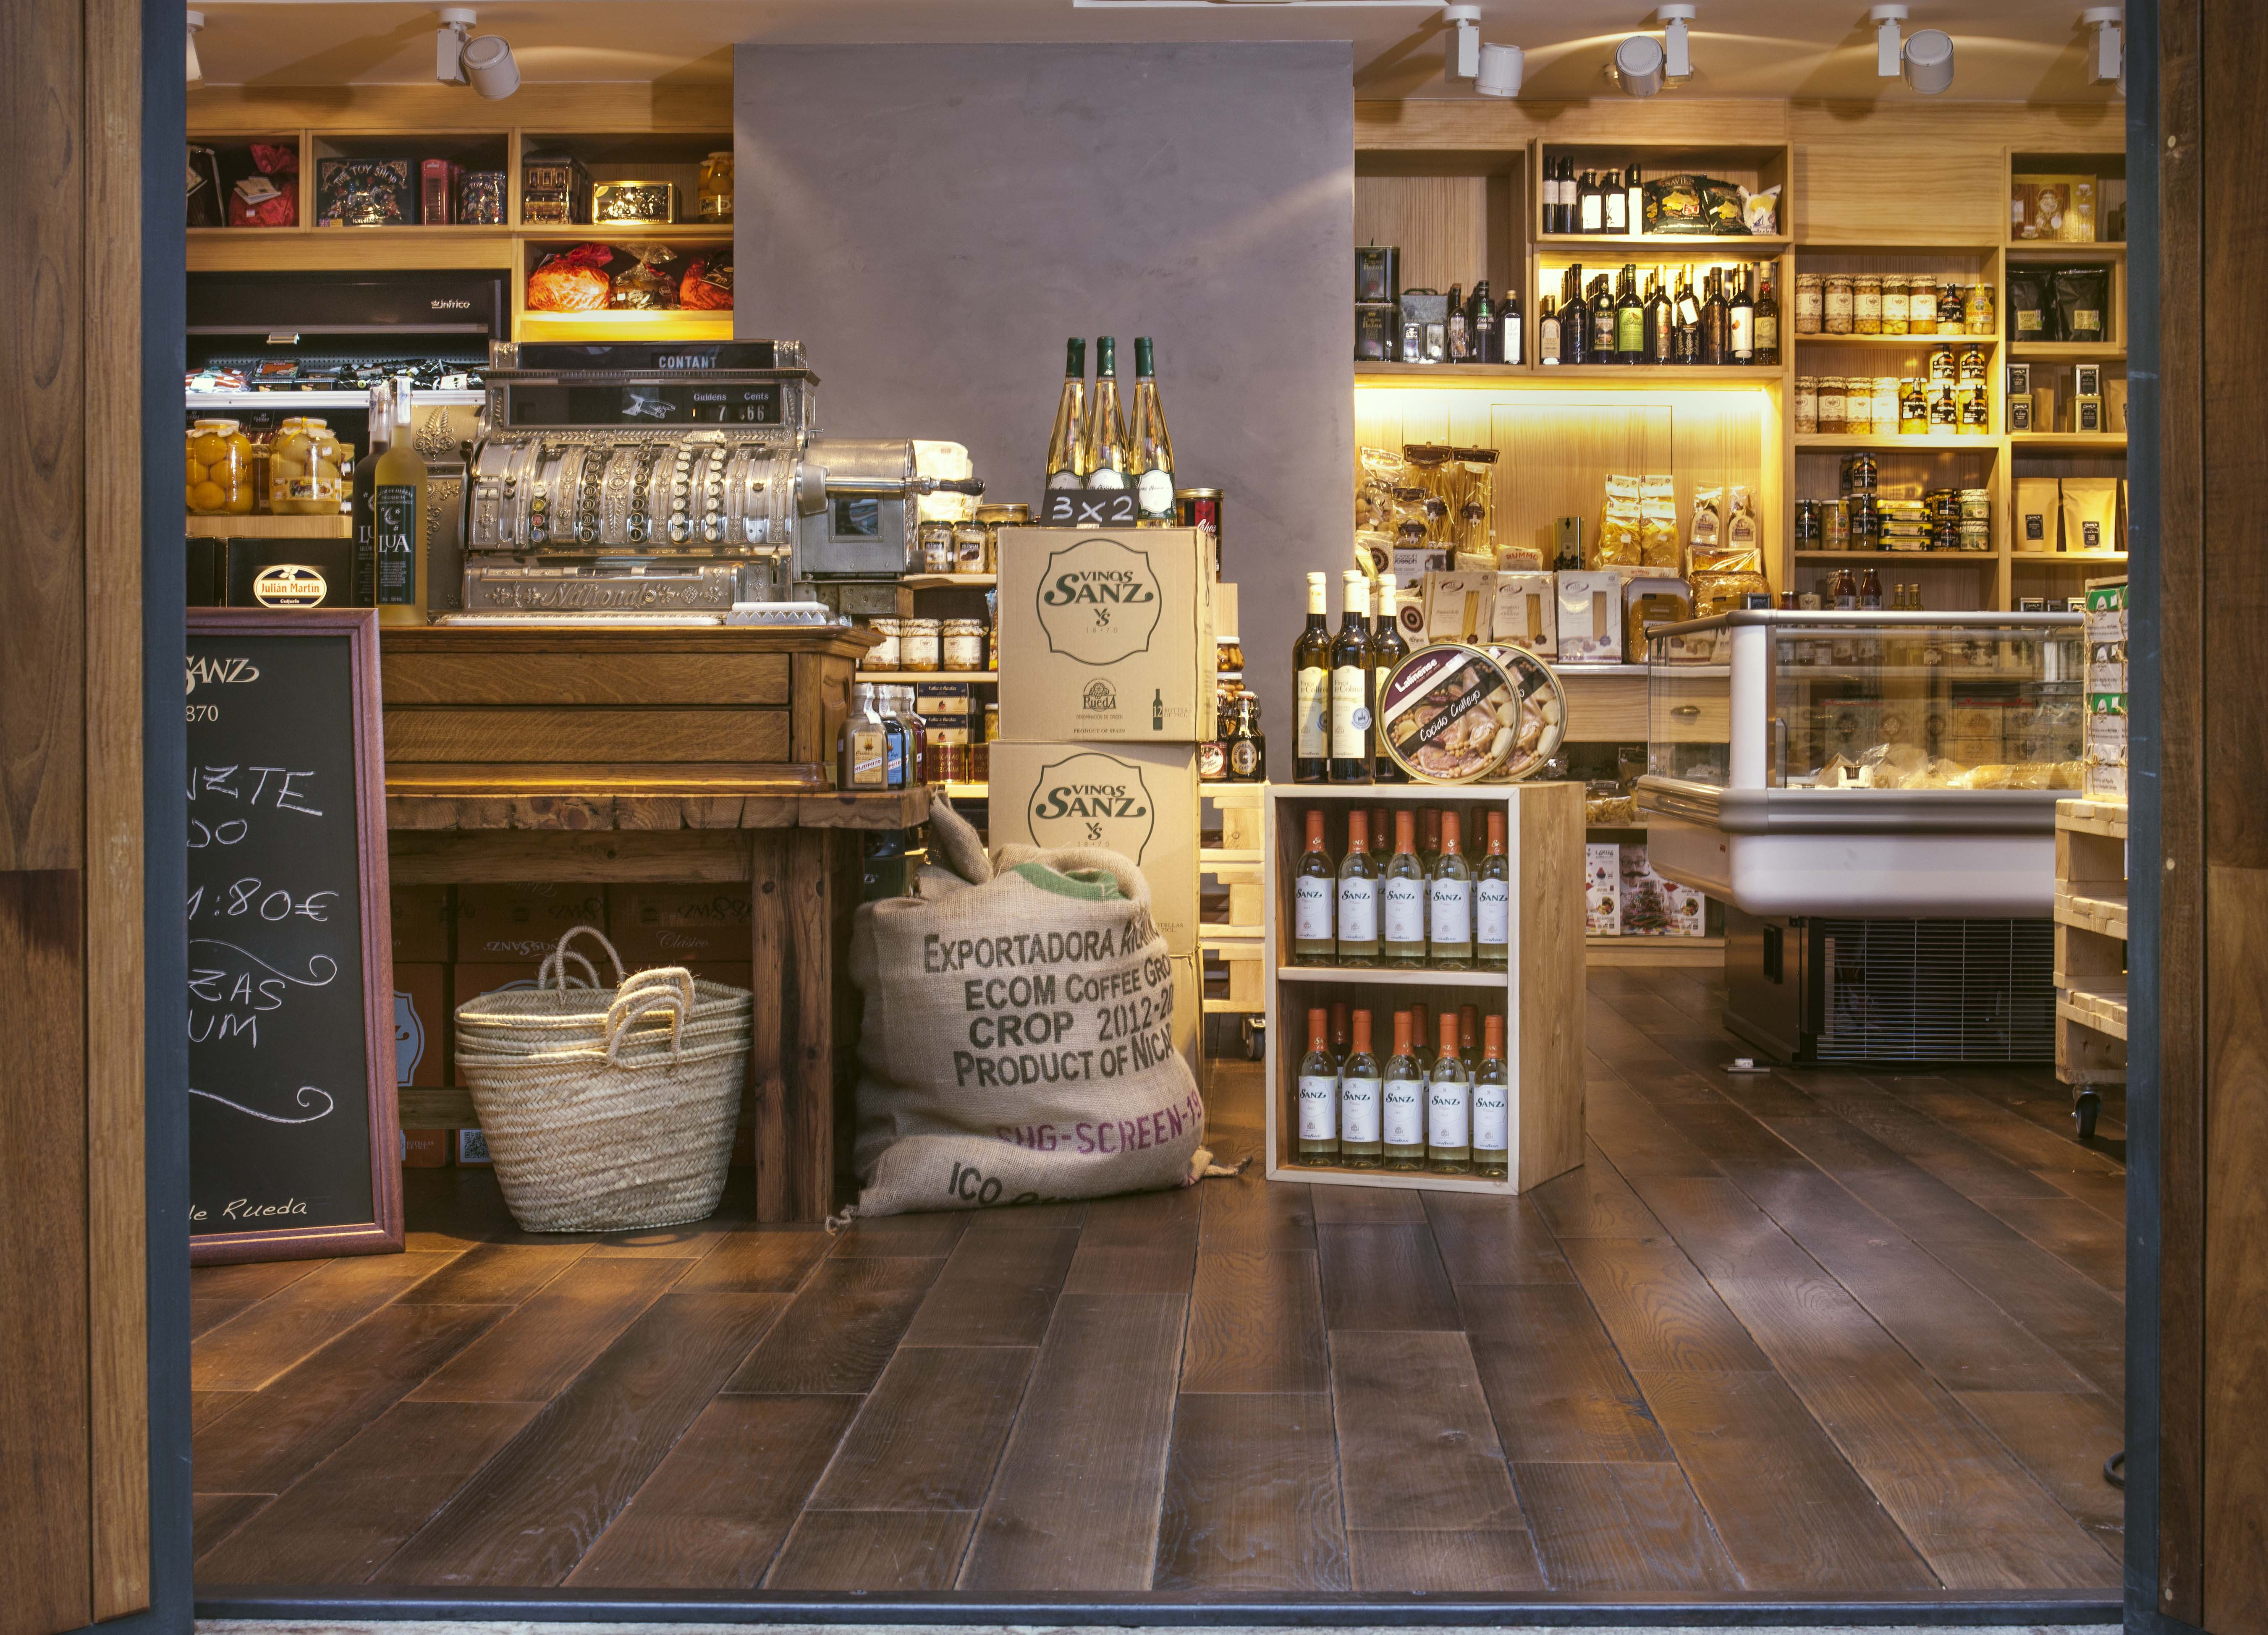 Kuboene Kuboene_natalia Casco 15 Abarrotes Tienda Gourmet # Muebles Para Tienda Gourmet